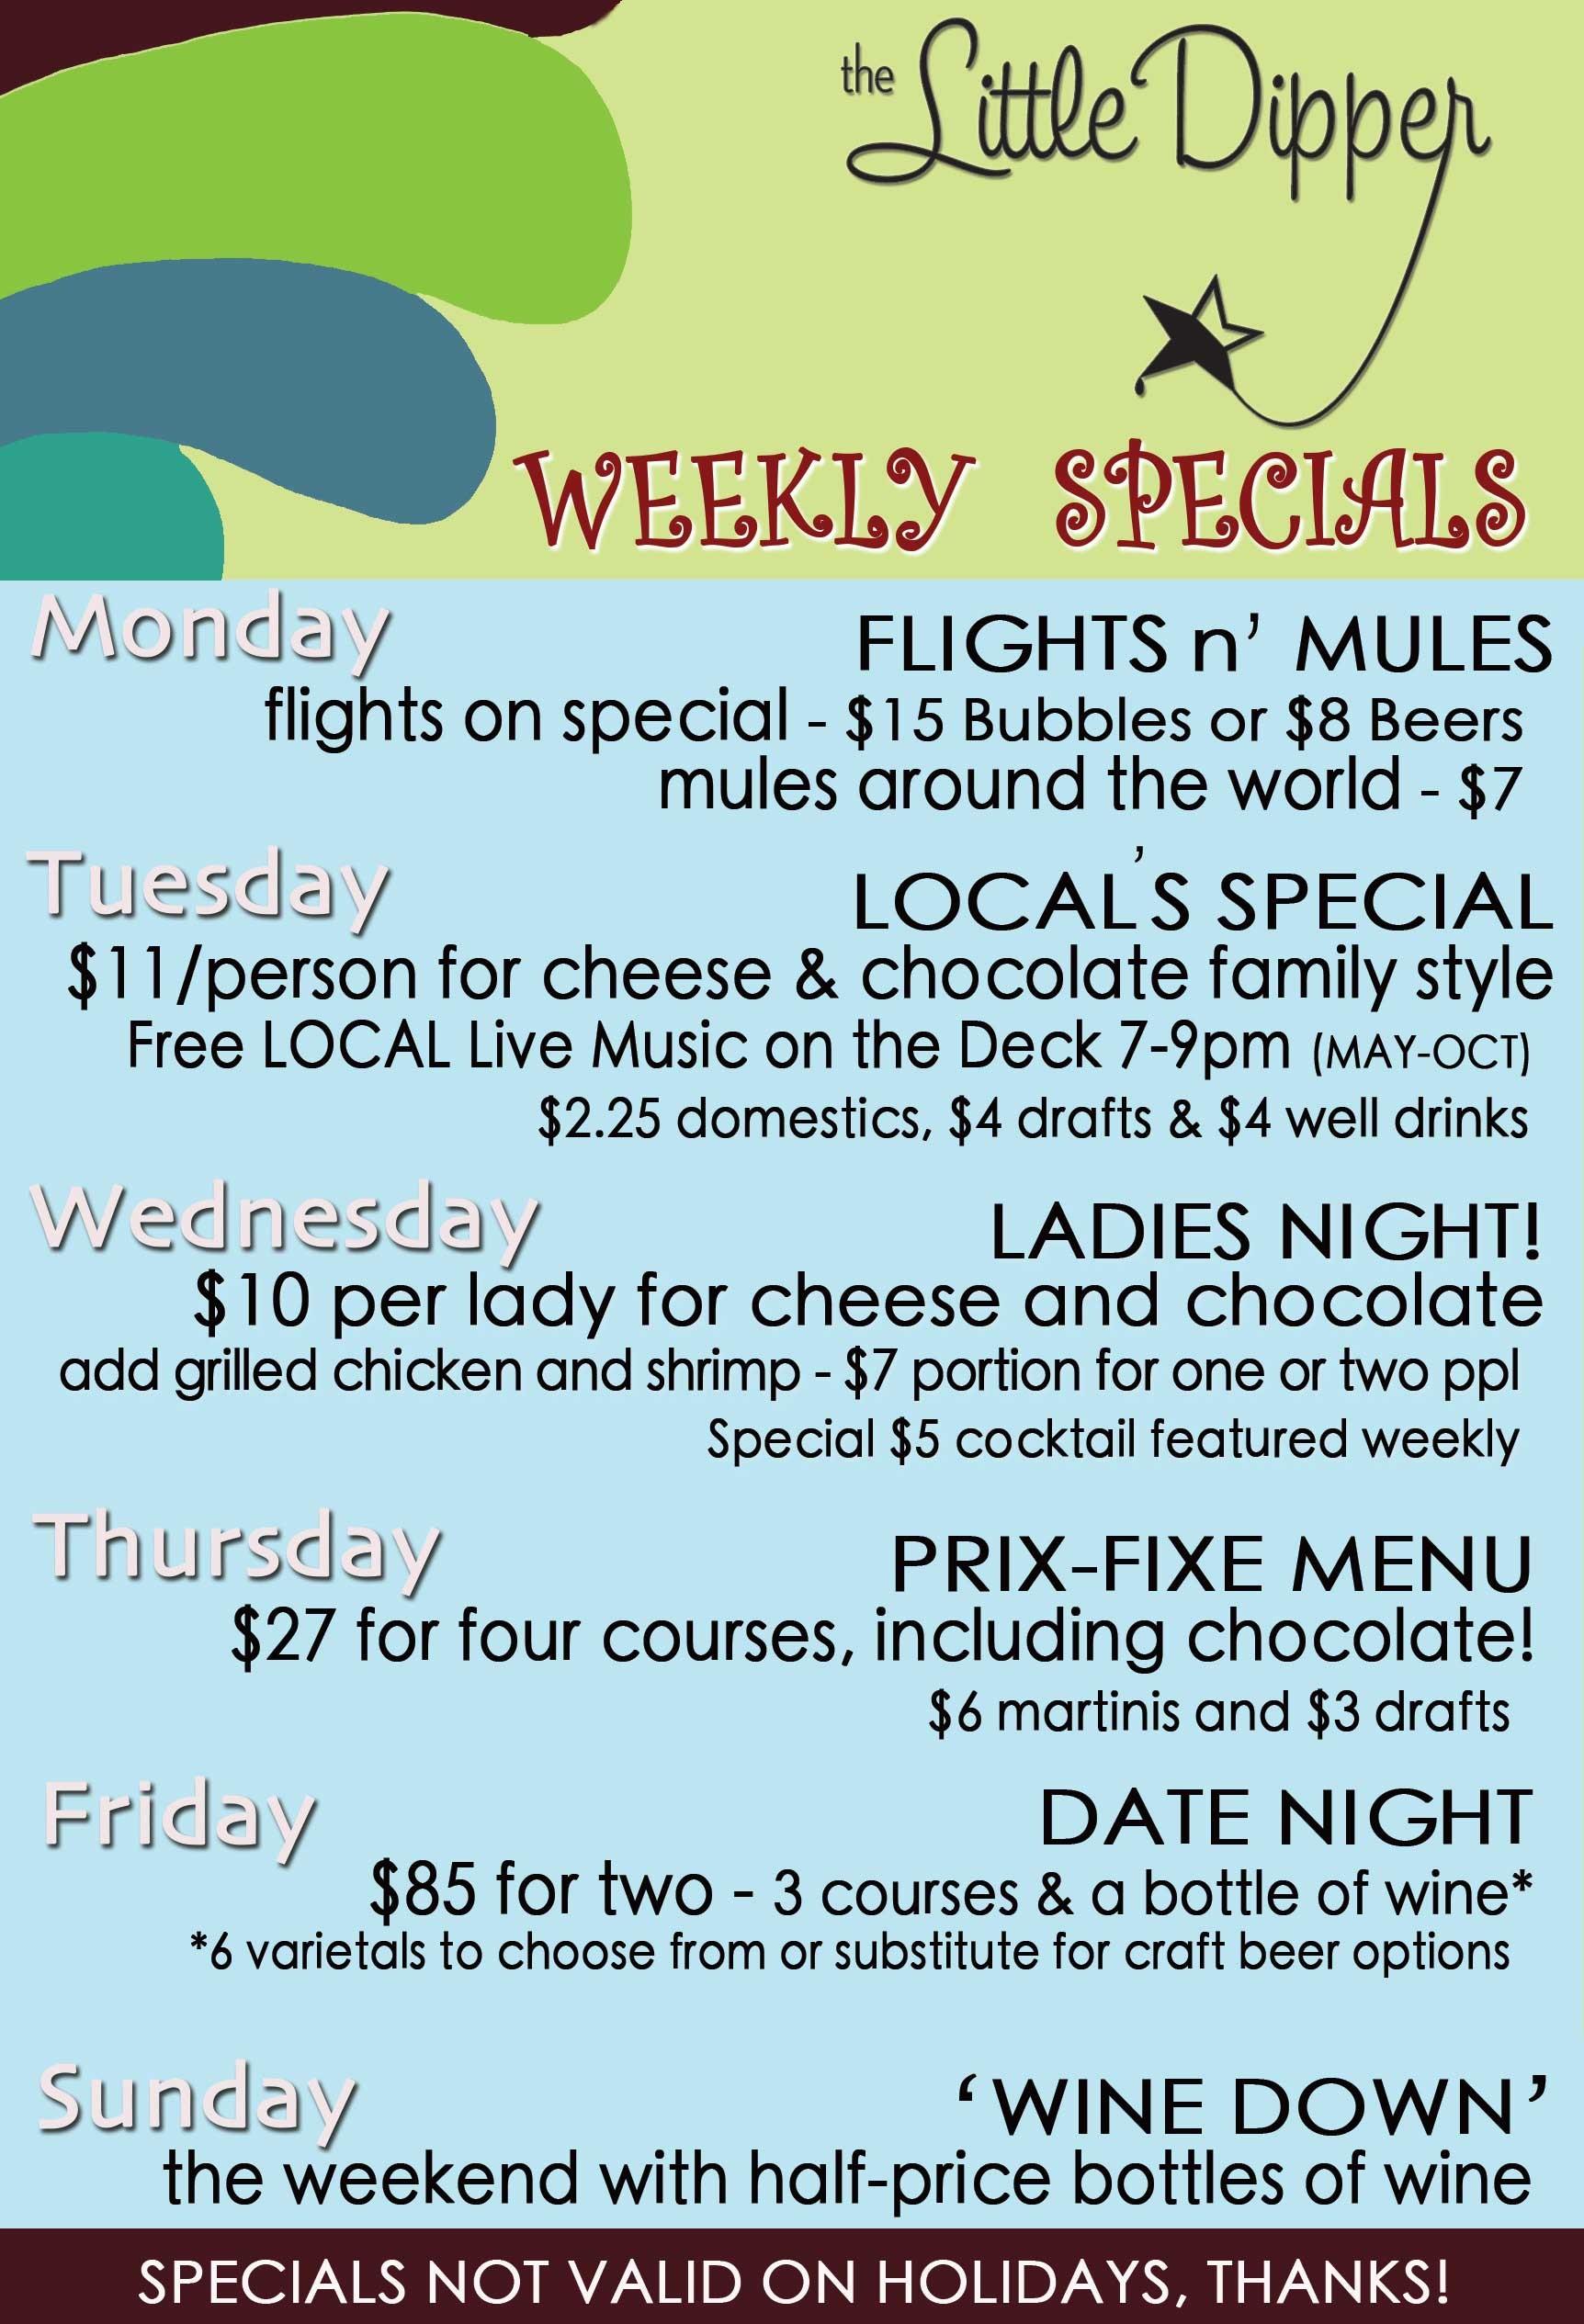 Litter Dipper Weekly Specials